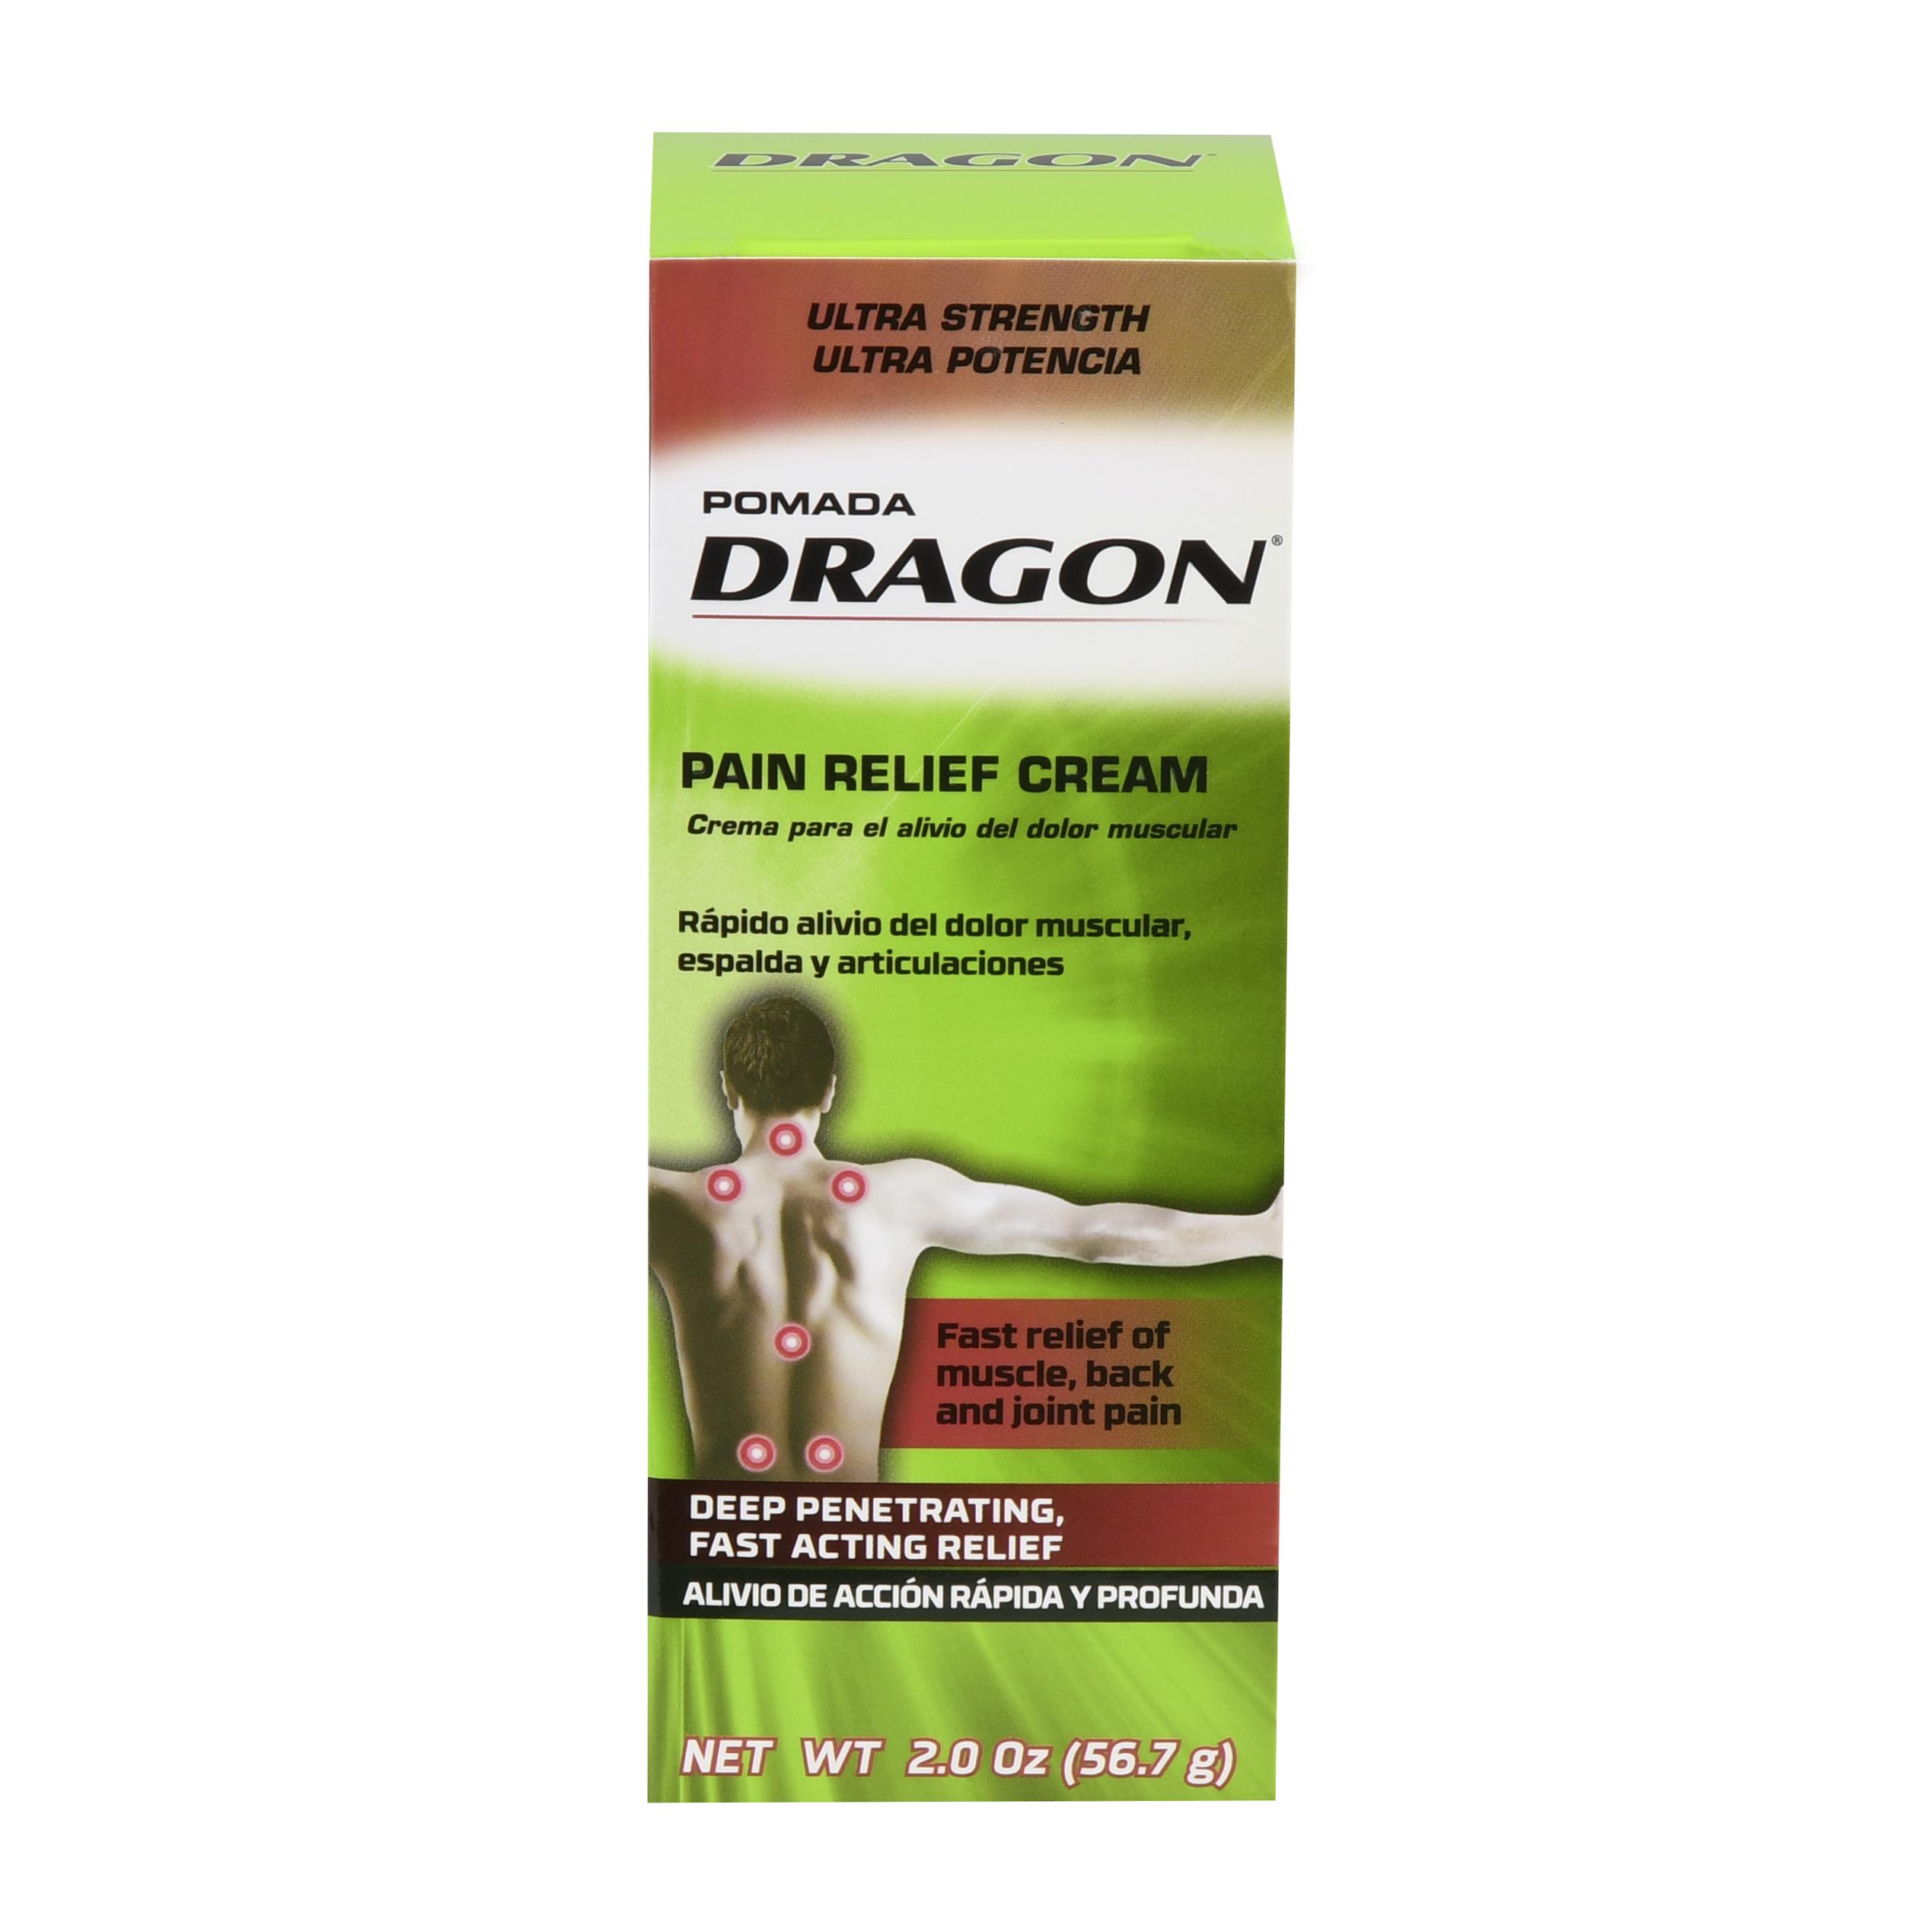 Dragon Ultra Strength Pain Relieving Cream, 2 oz